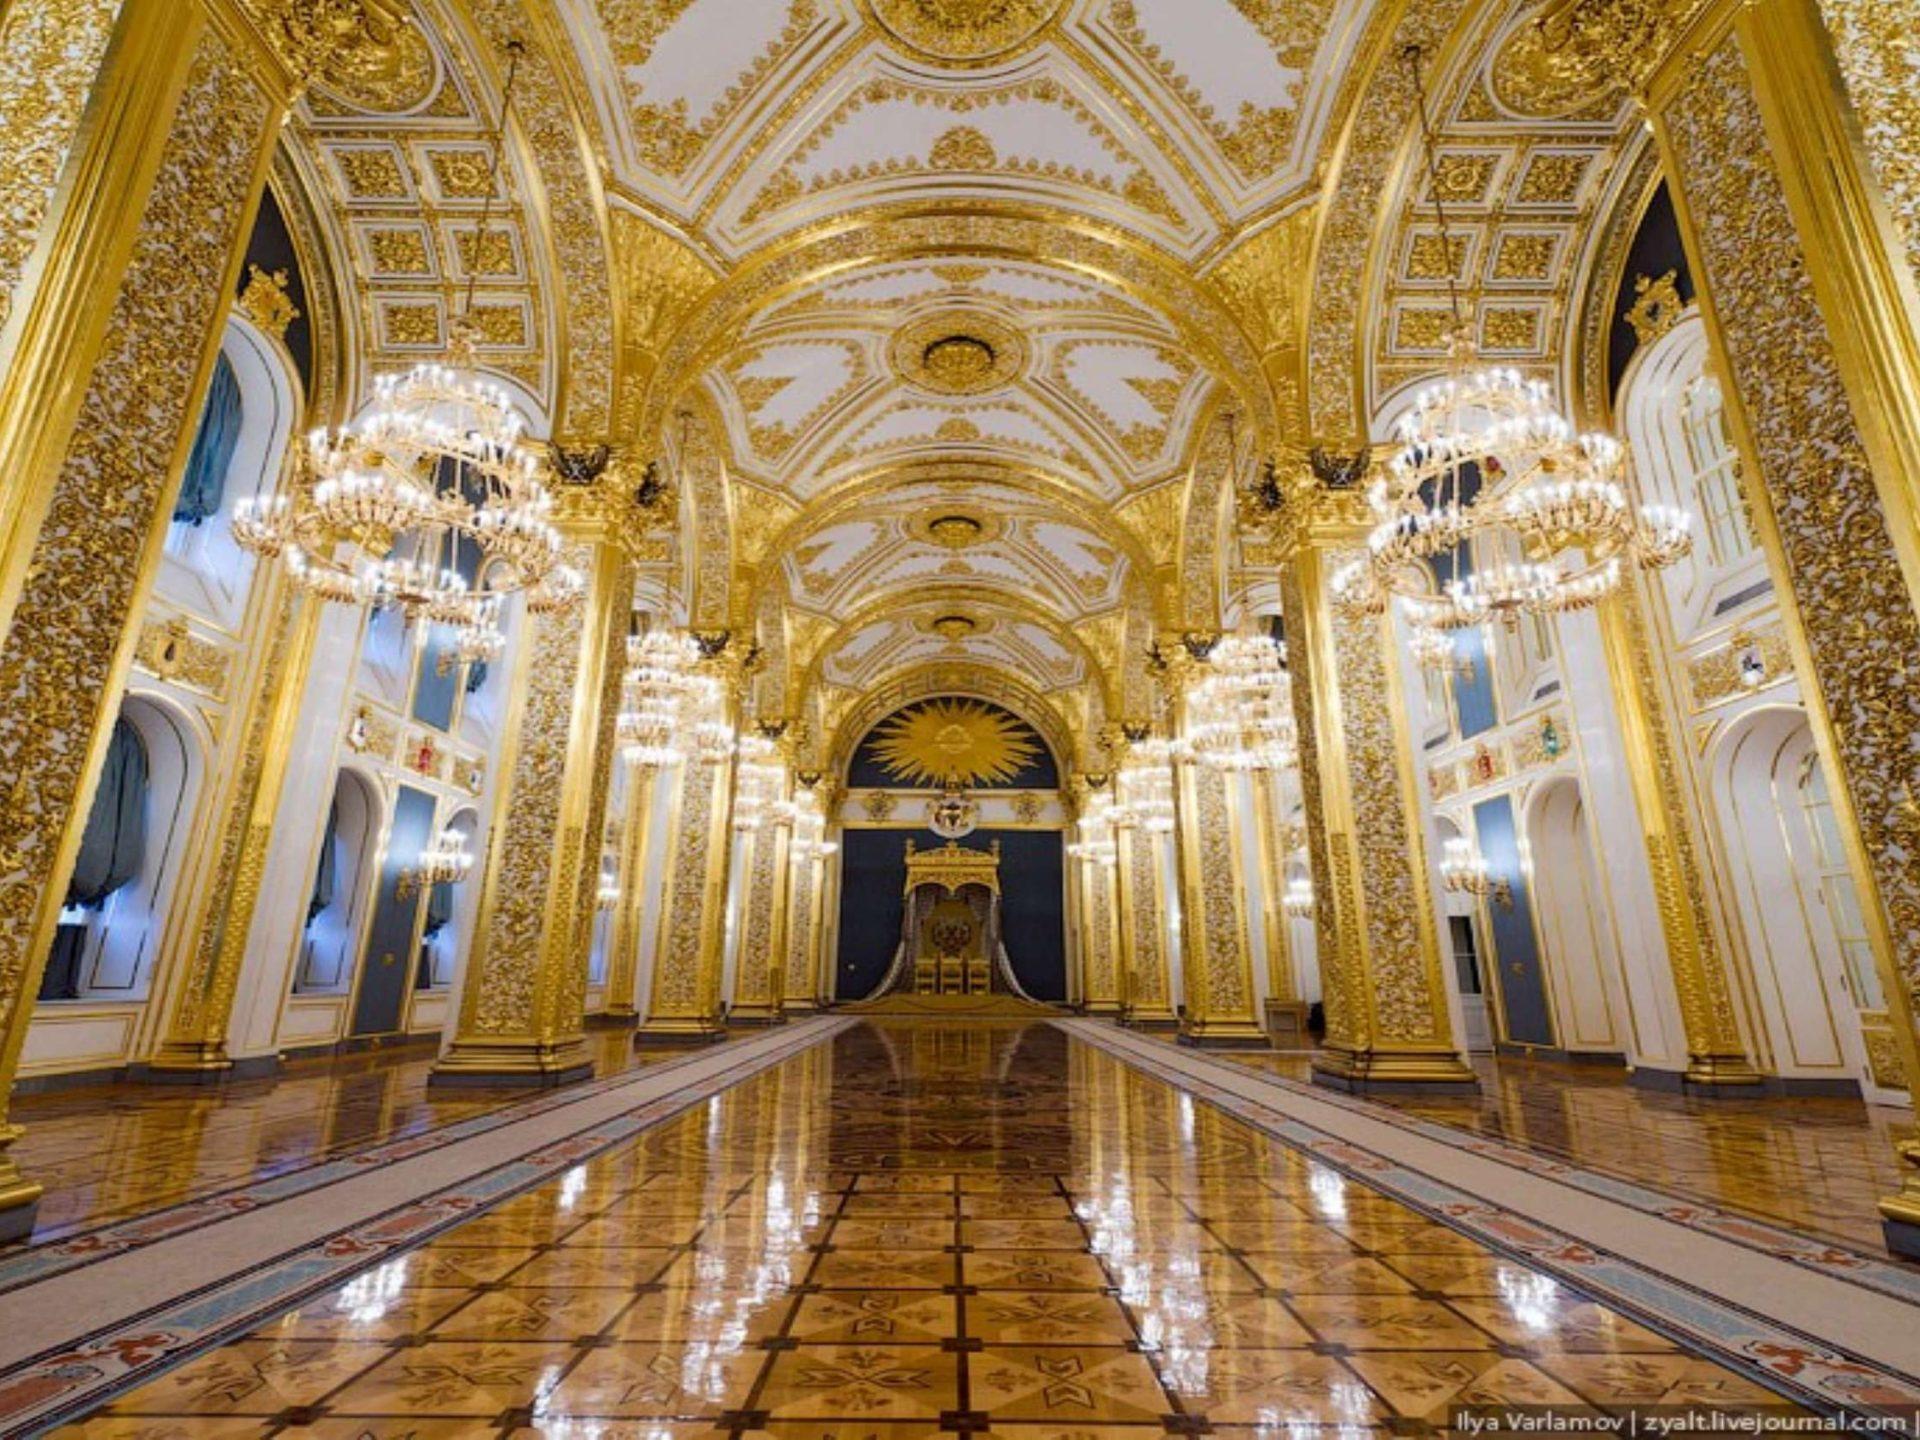 El arte en Rusia. - Página 3 Inside-Grand-Kremlin-Palace-Moscow-18-1920x1440